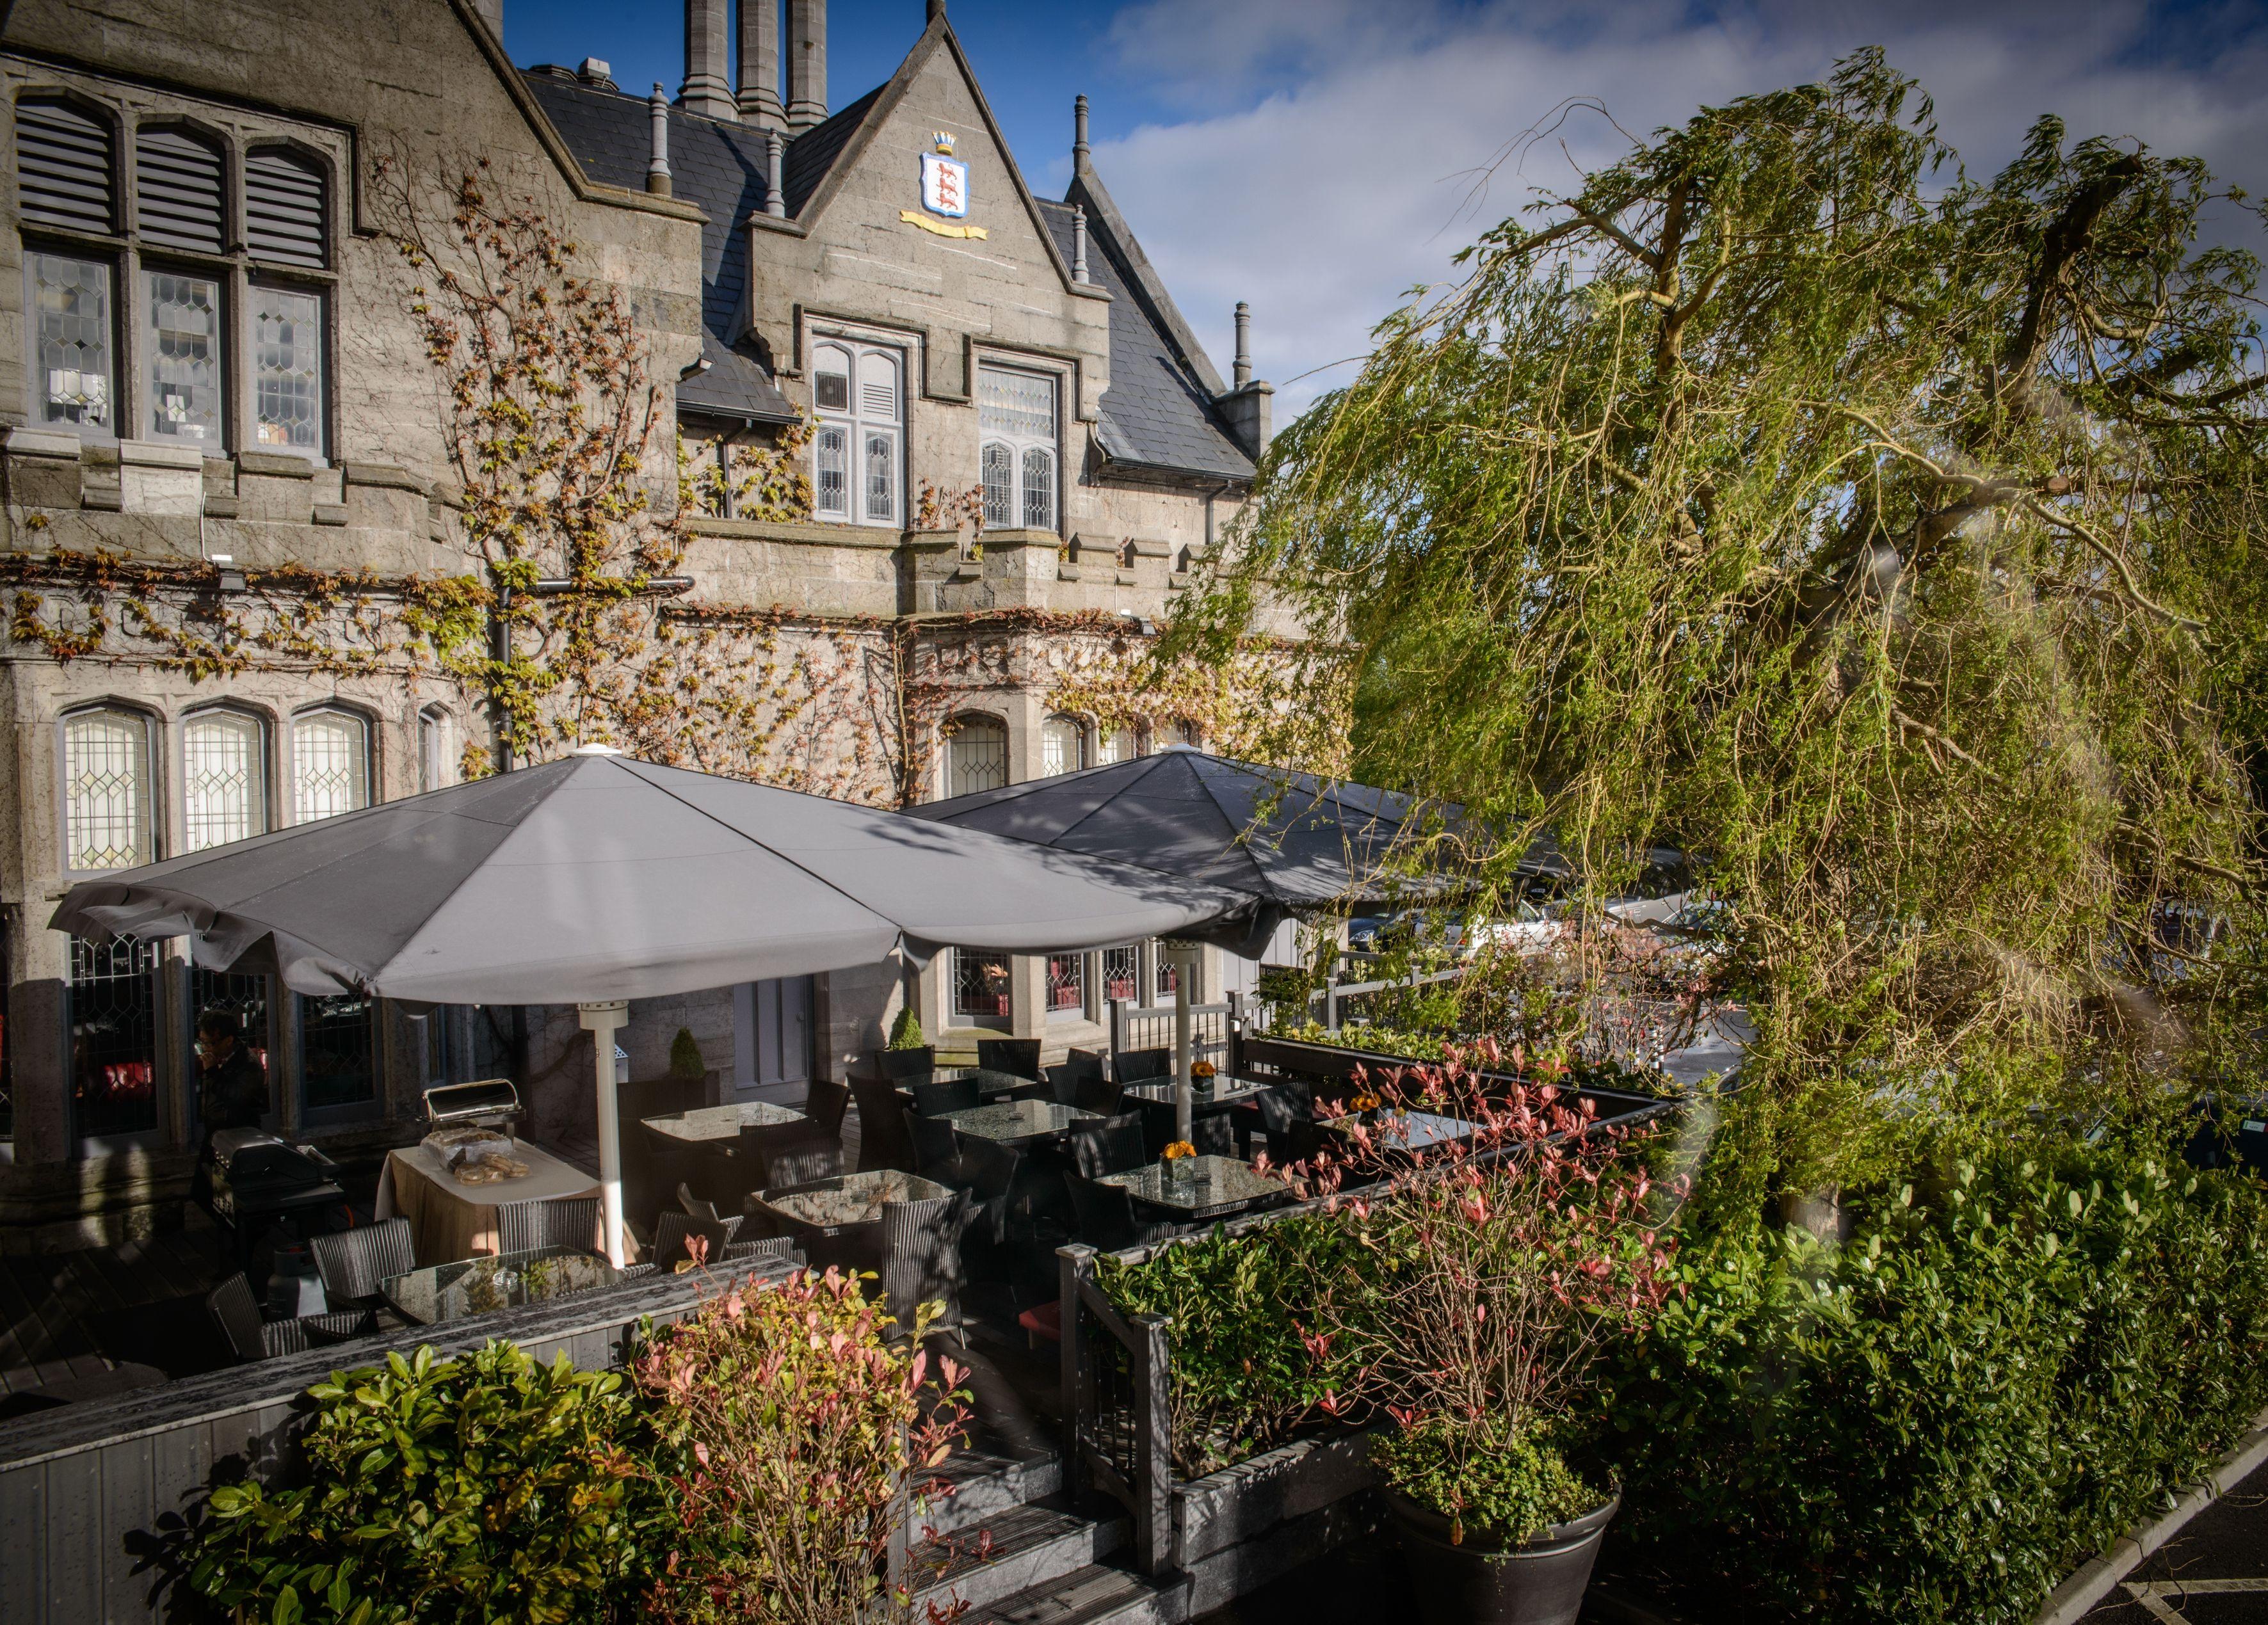 Clontarf Castle Hotels outdoor decking area